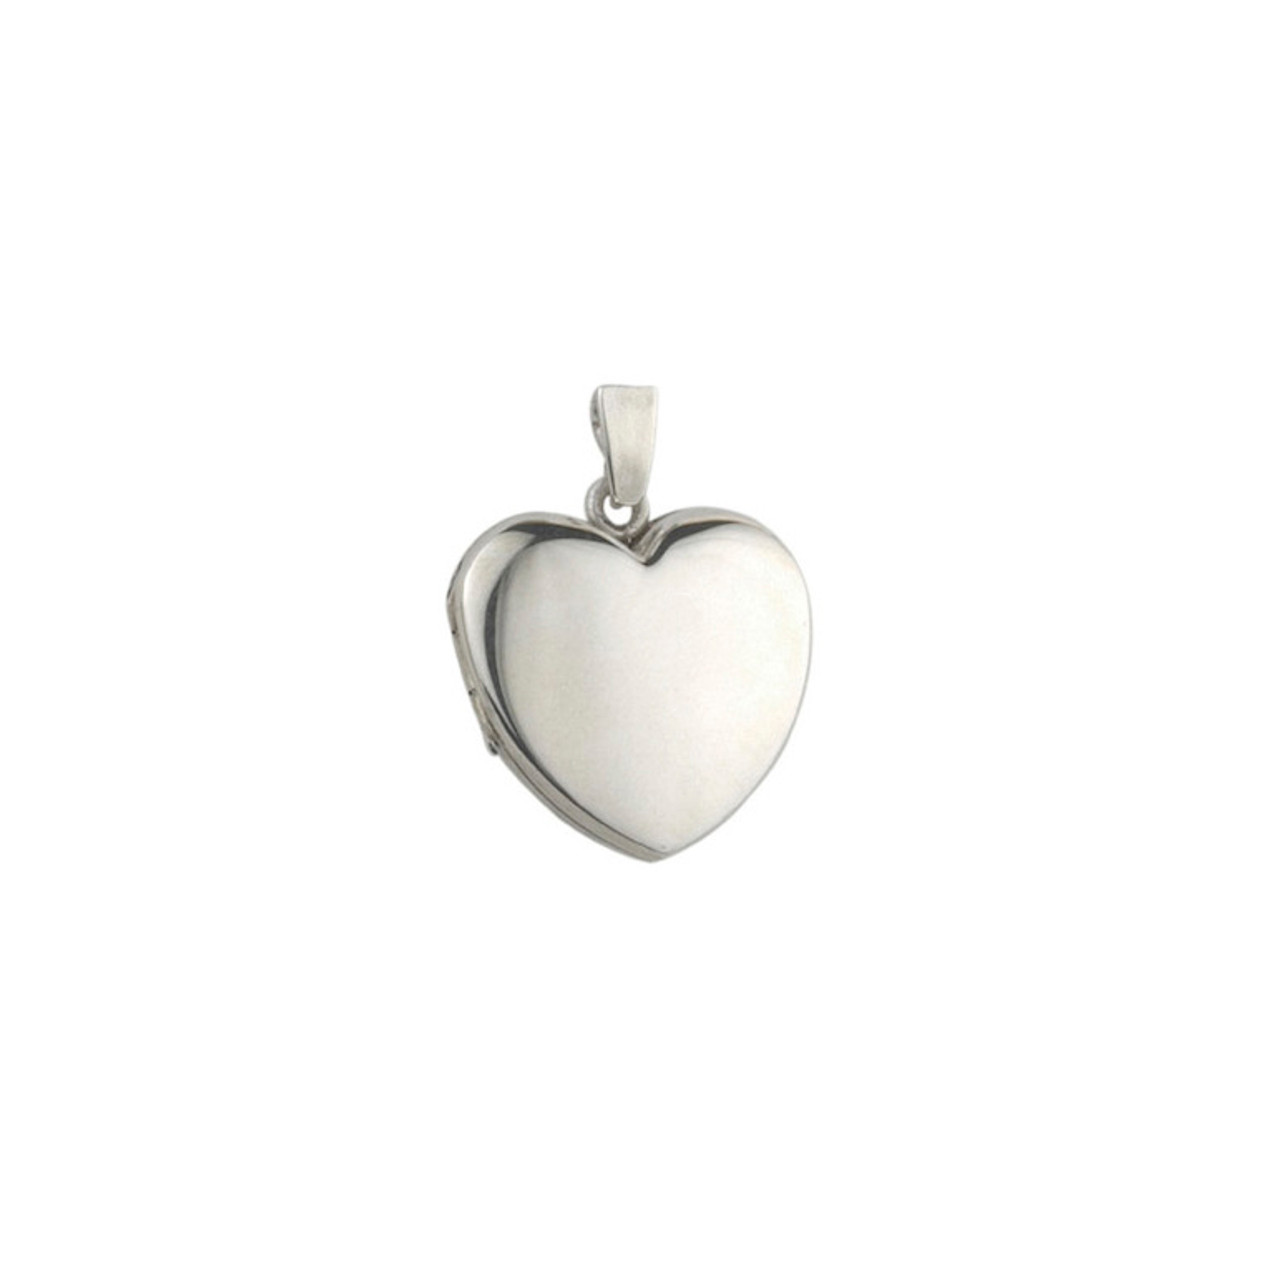 Silver 19mm Heart shaped Locket & Chain